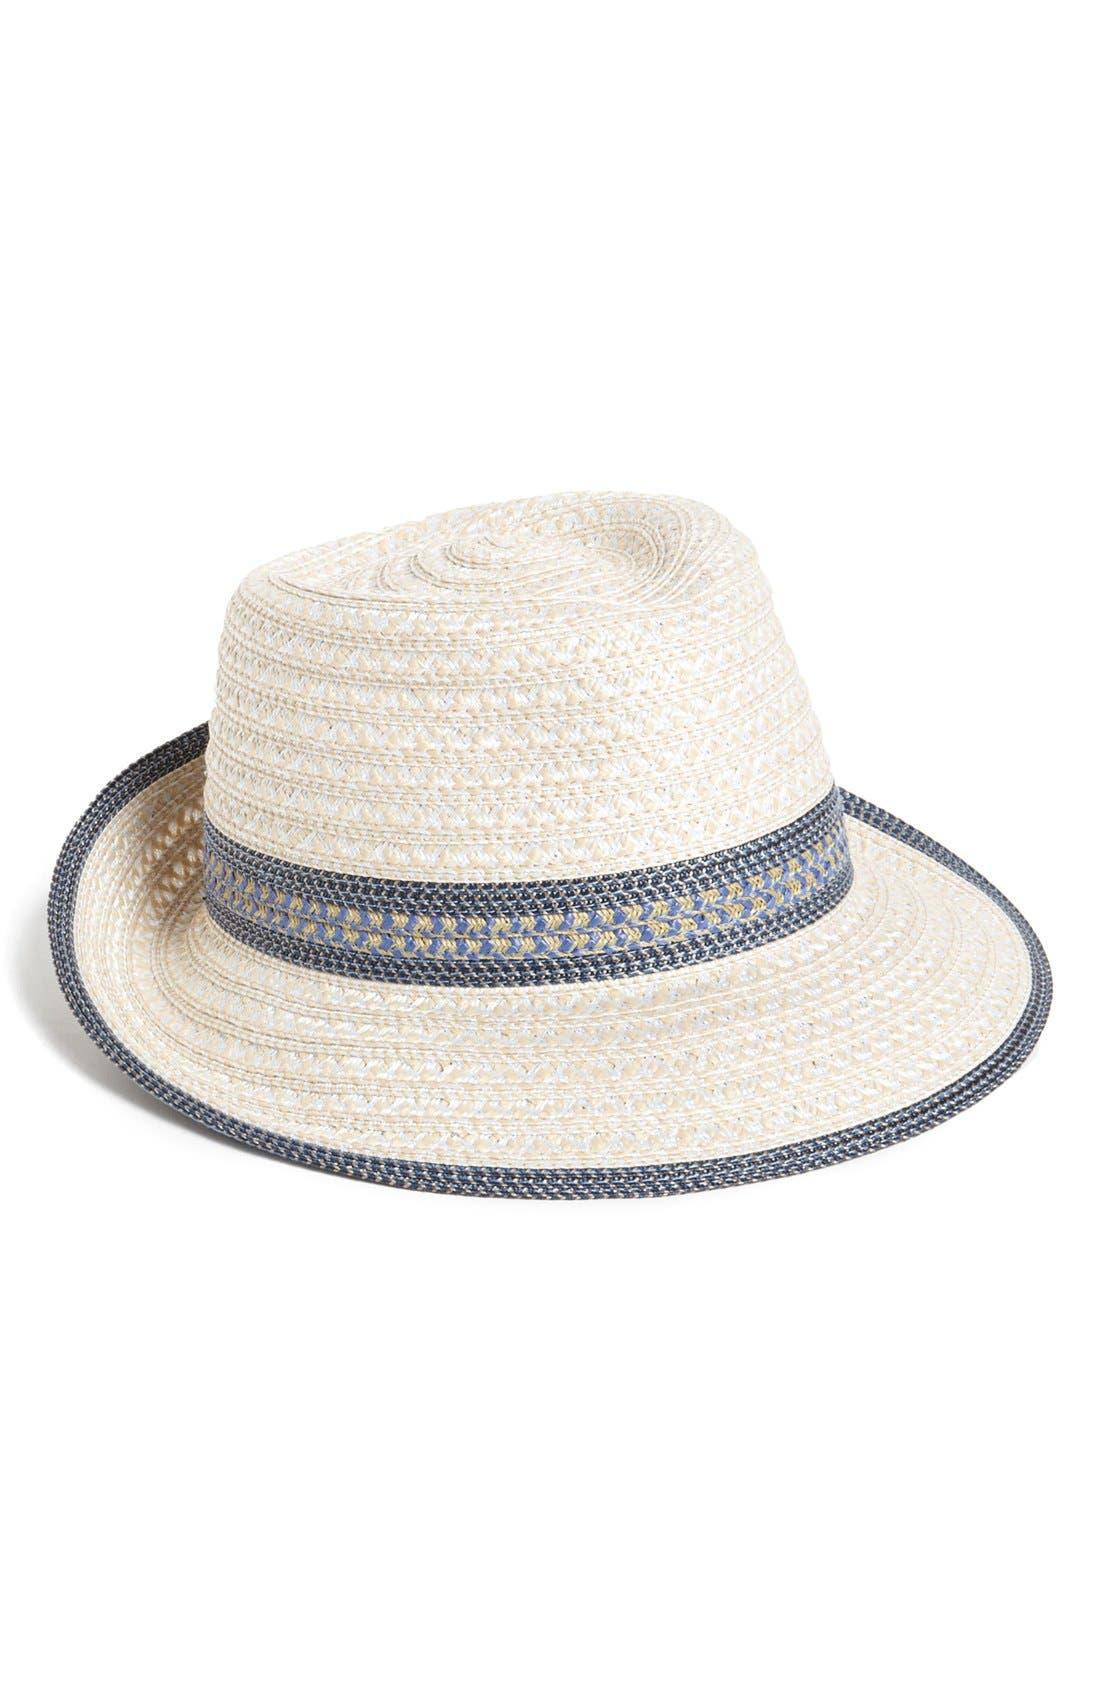 Squishee<sup>®</sup> Straw Fedora,                         Main,                         color, Cream/ Blue Tweed